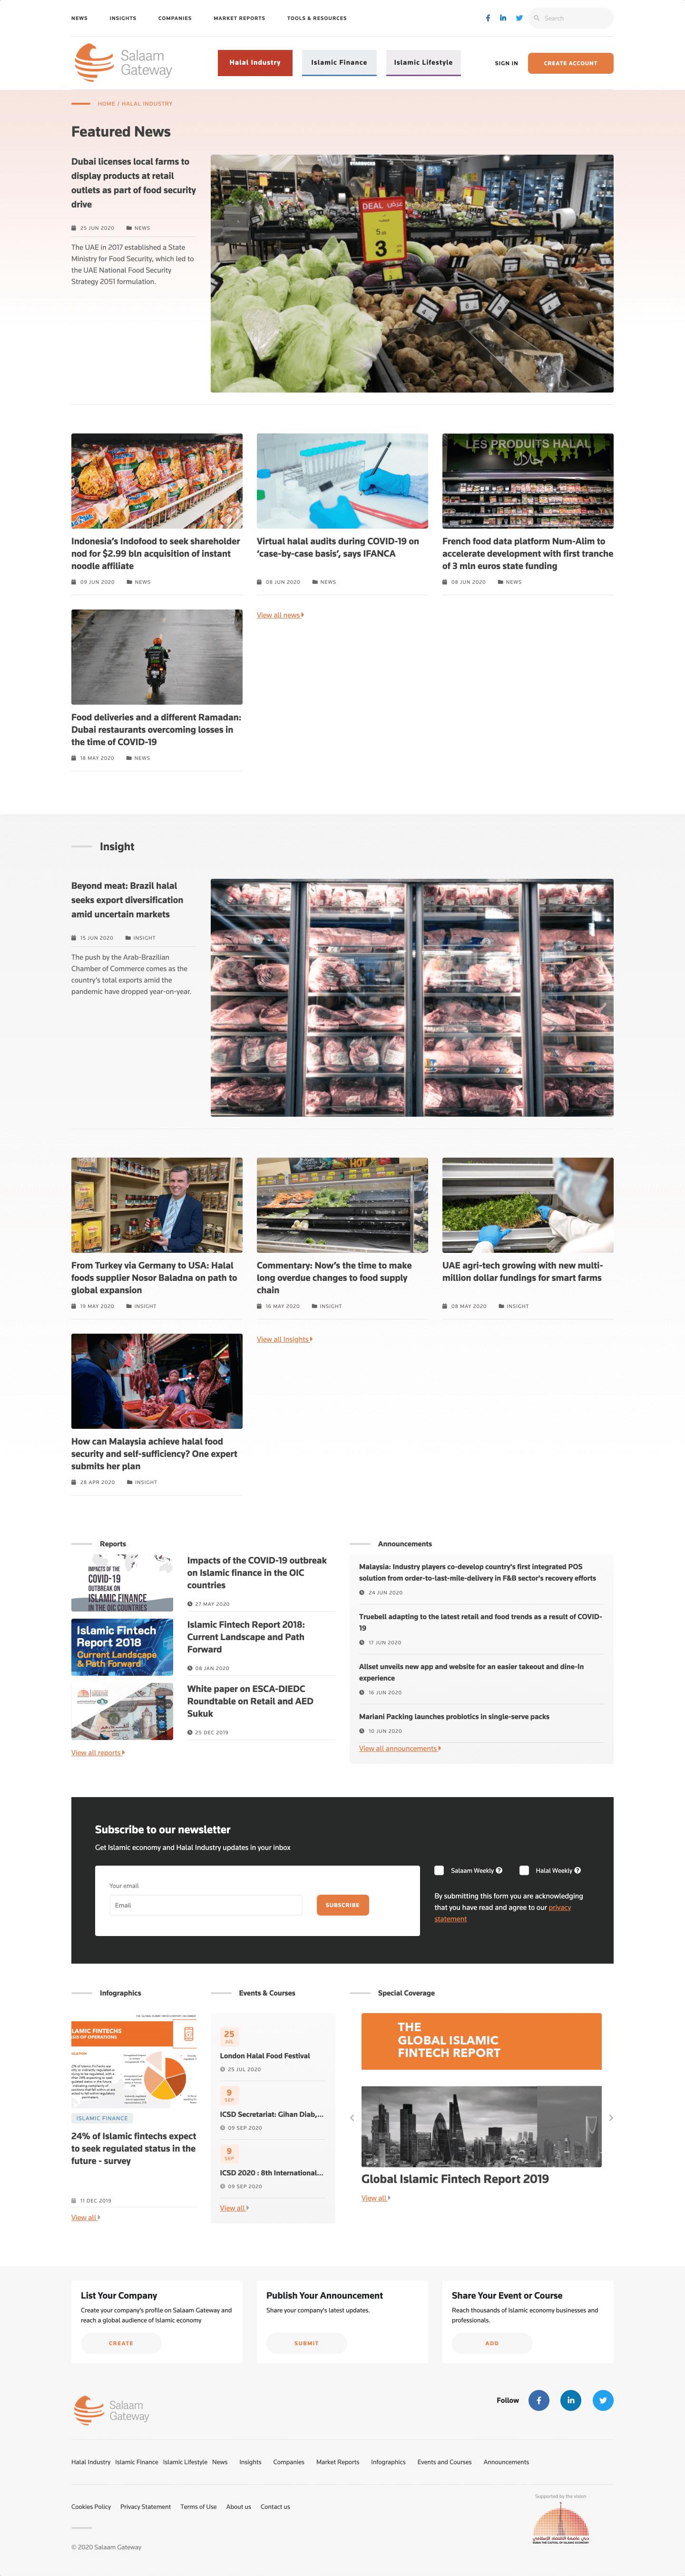 SG-Halal-Industry